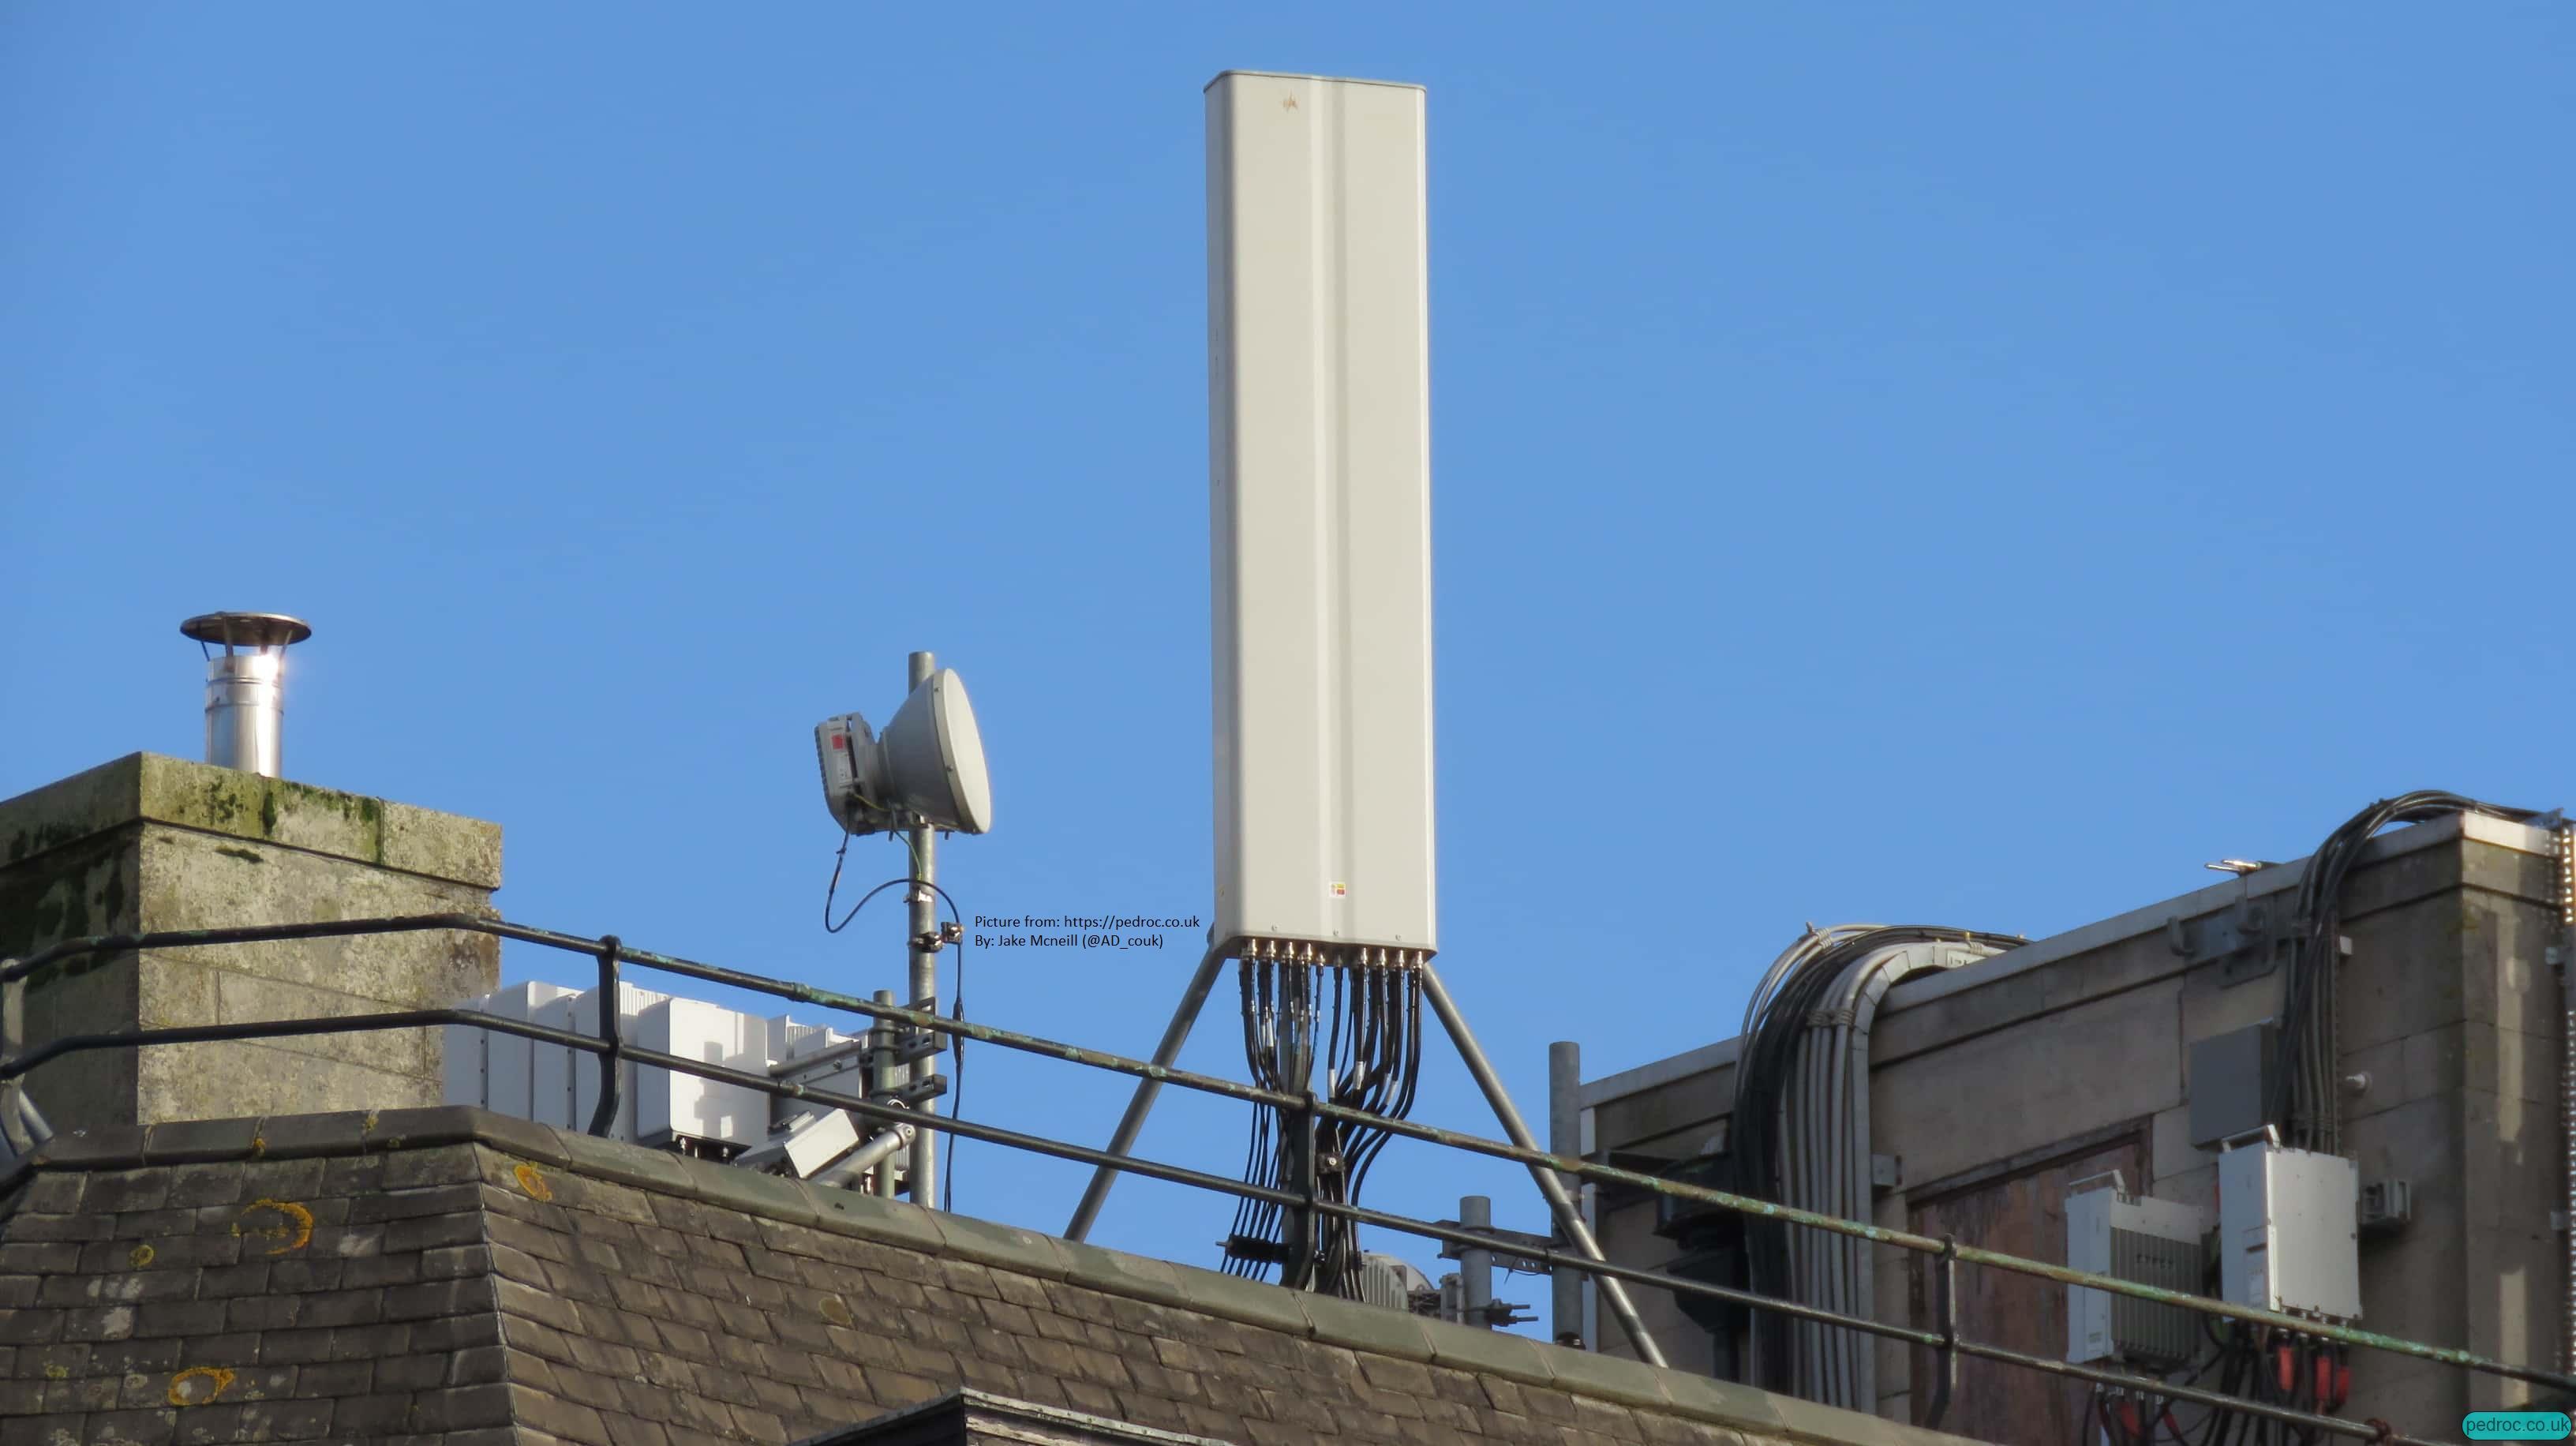 O2 Ericsson 8T8R 5G with Commscope antennas